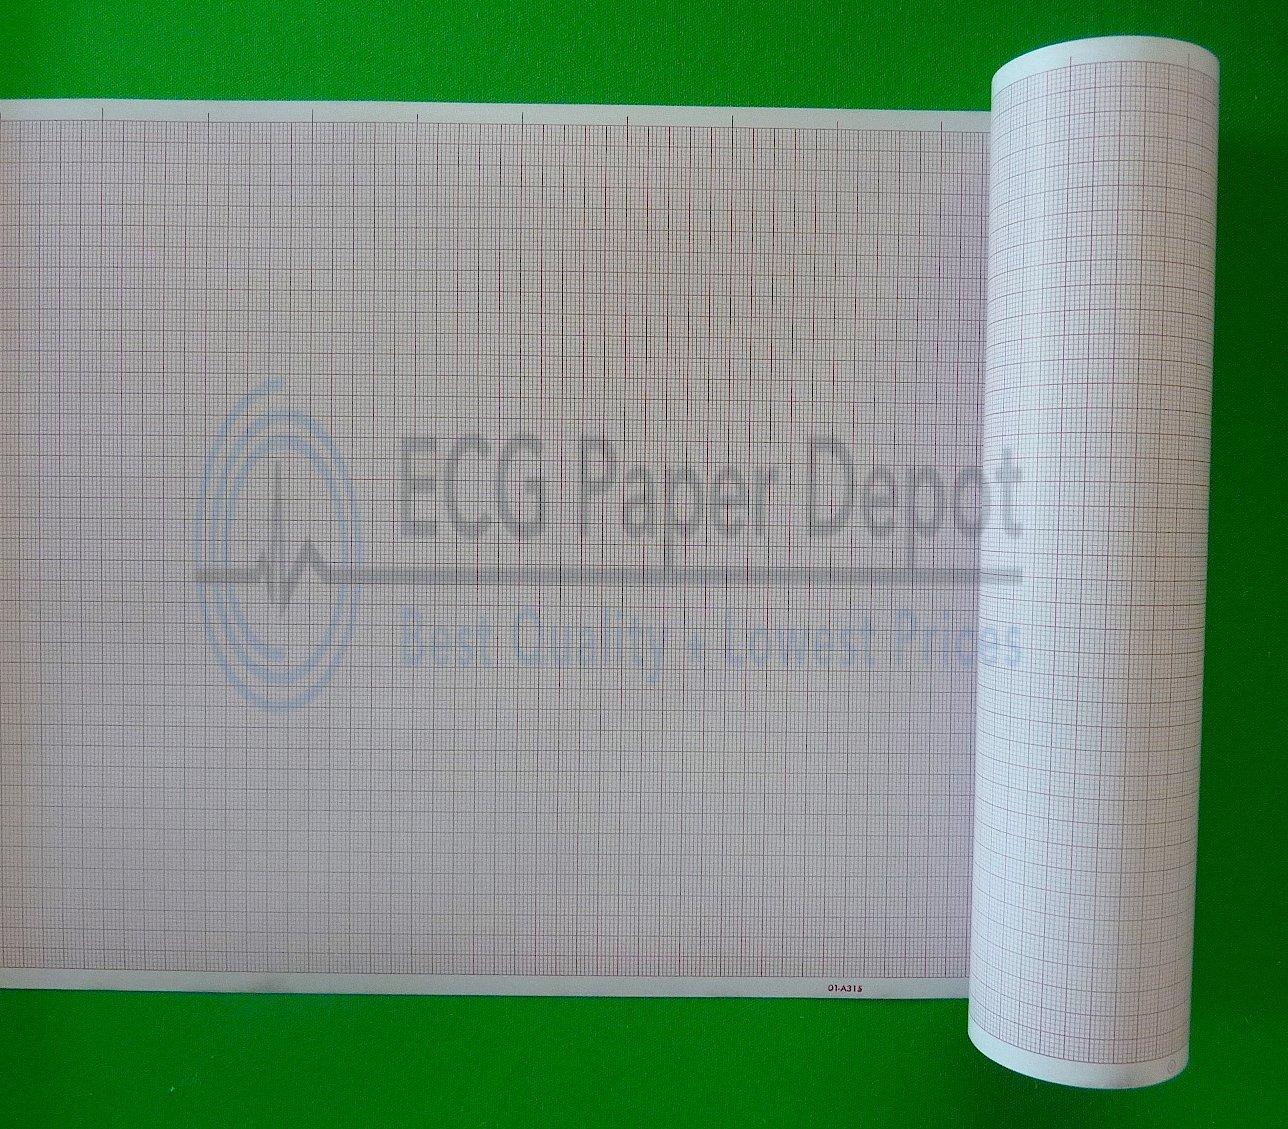 Bionet Compatible EKG-GP Medical Cardiology Recording Chart Paper, 25 Rolls Per Case, Size 215mm x 82', Grid Color Red